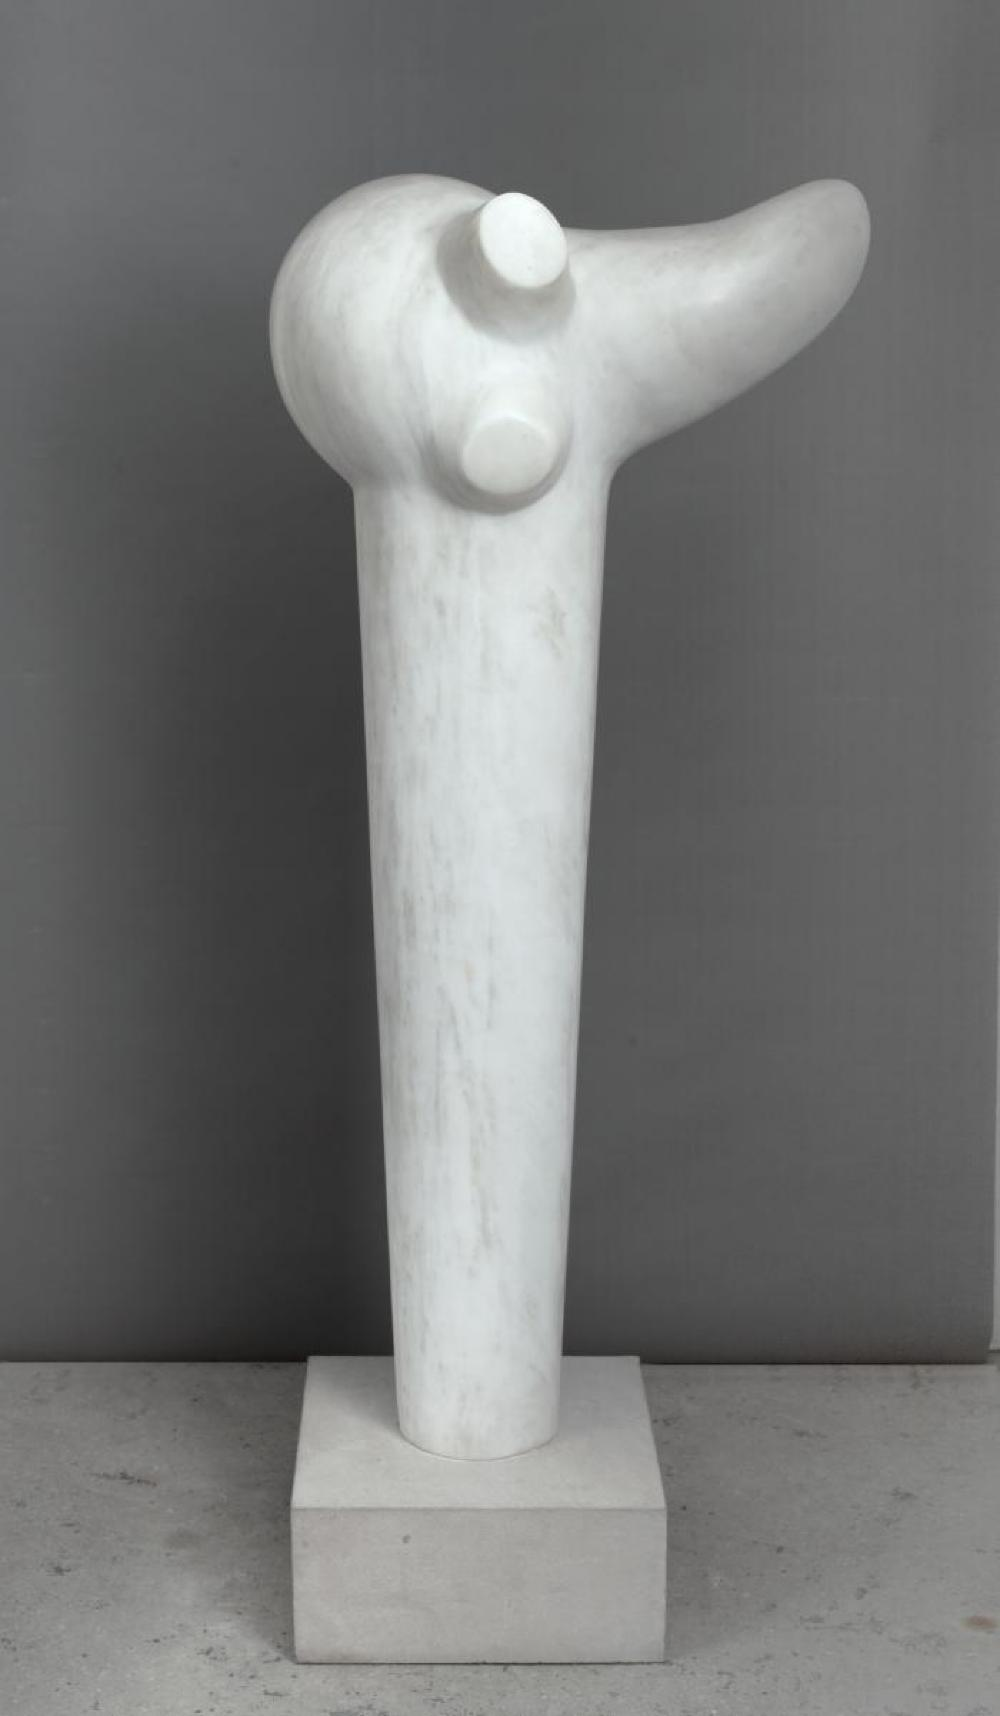 Bird B, image 2